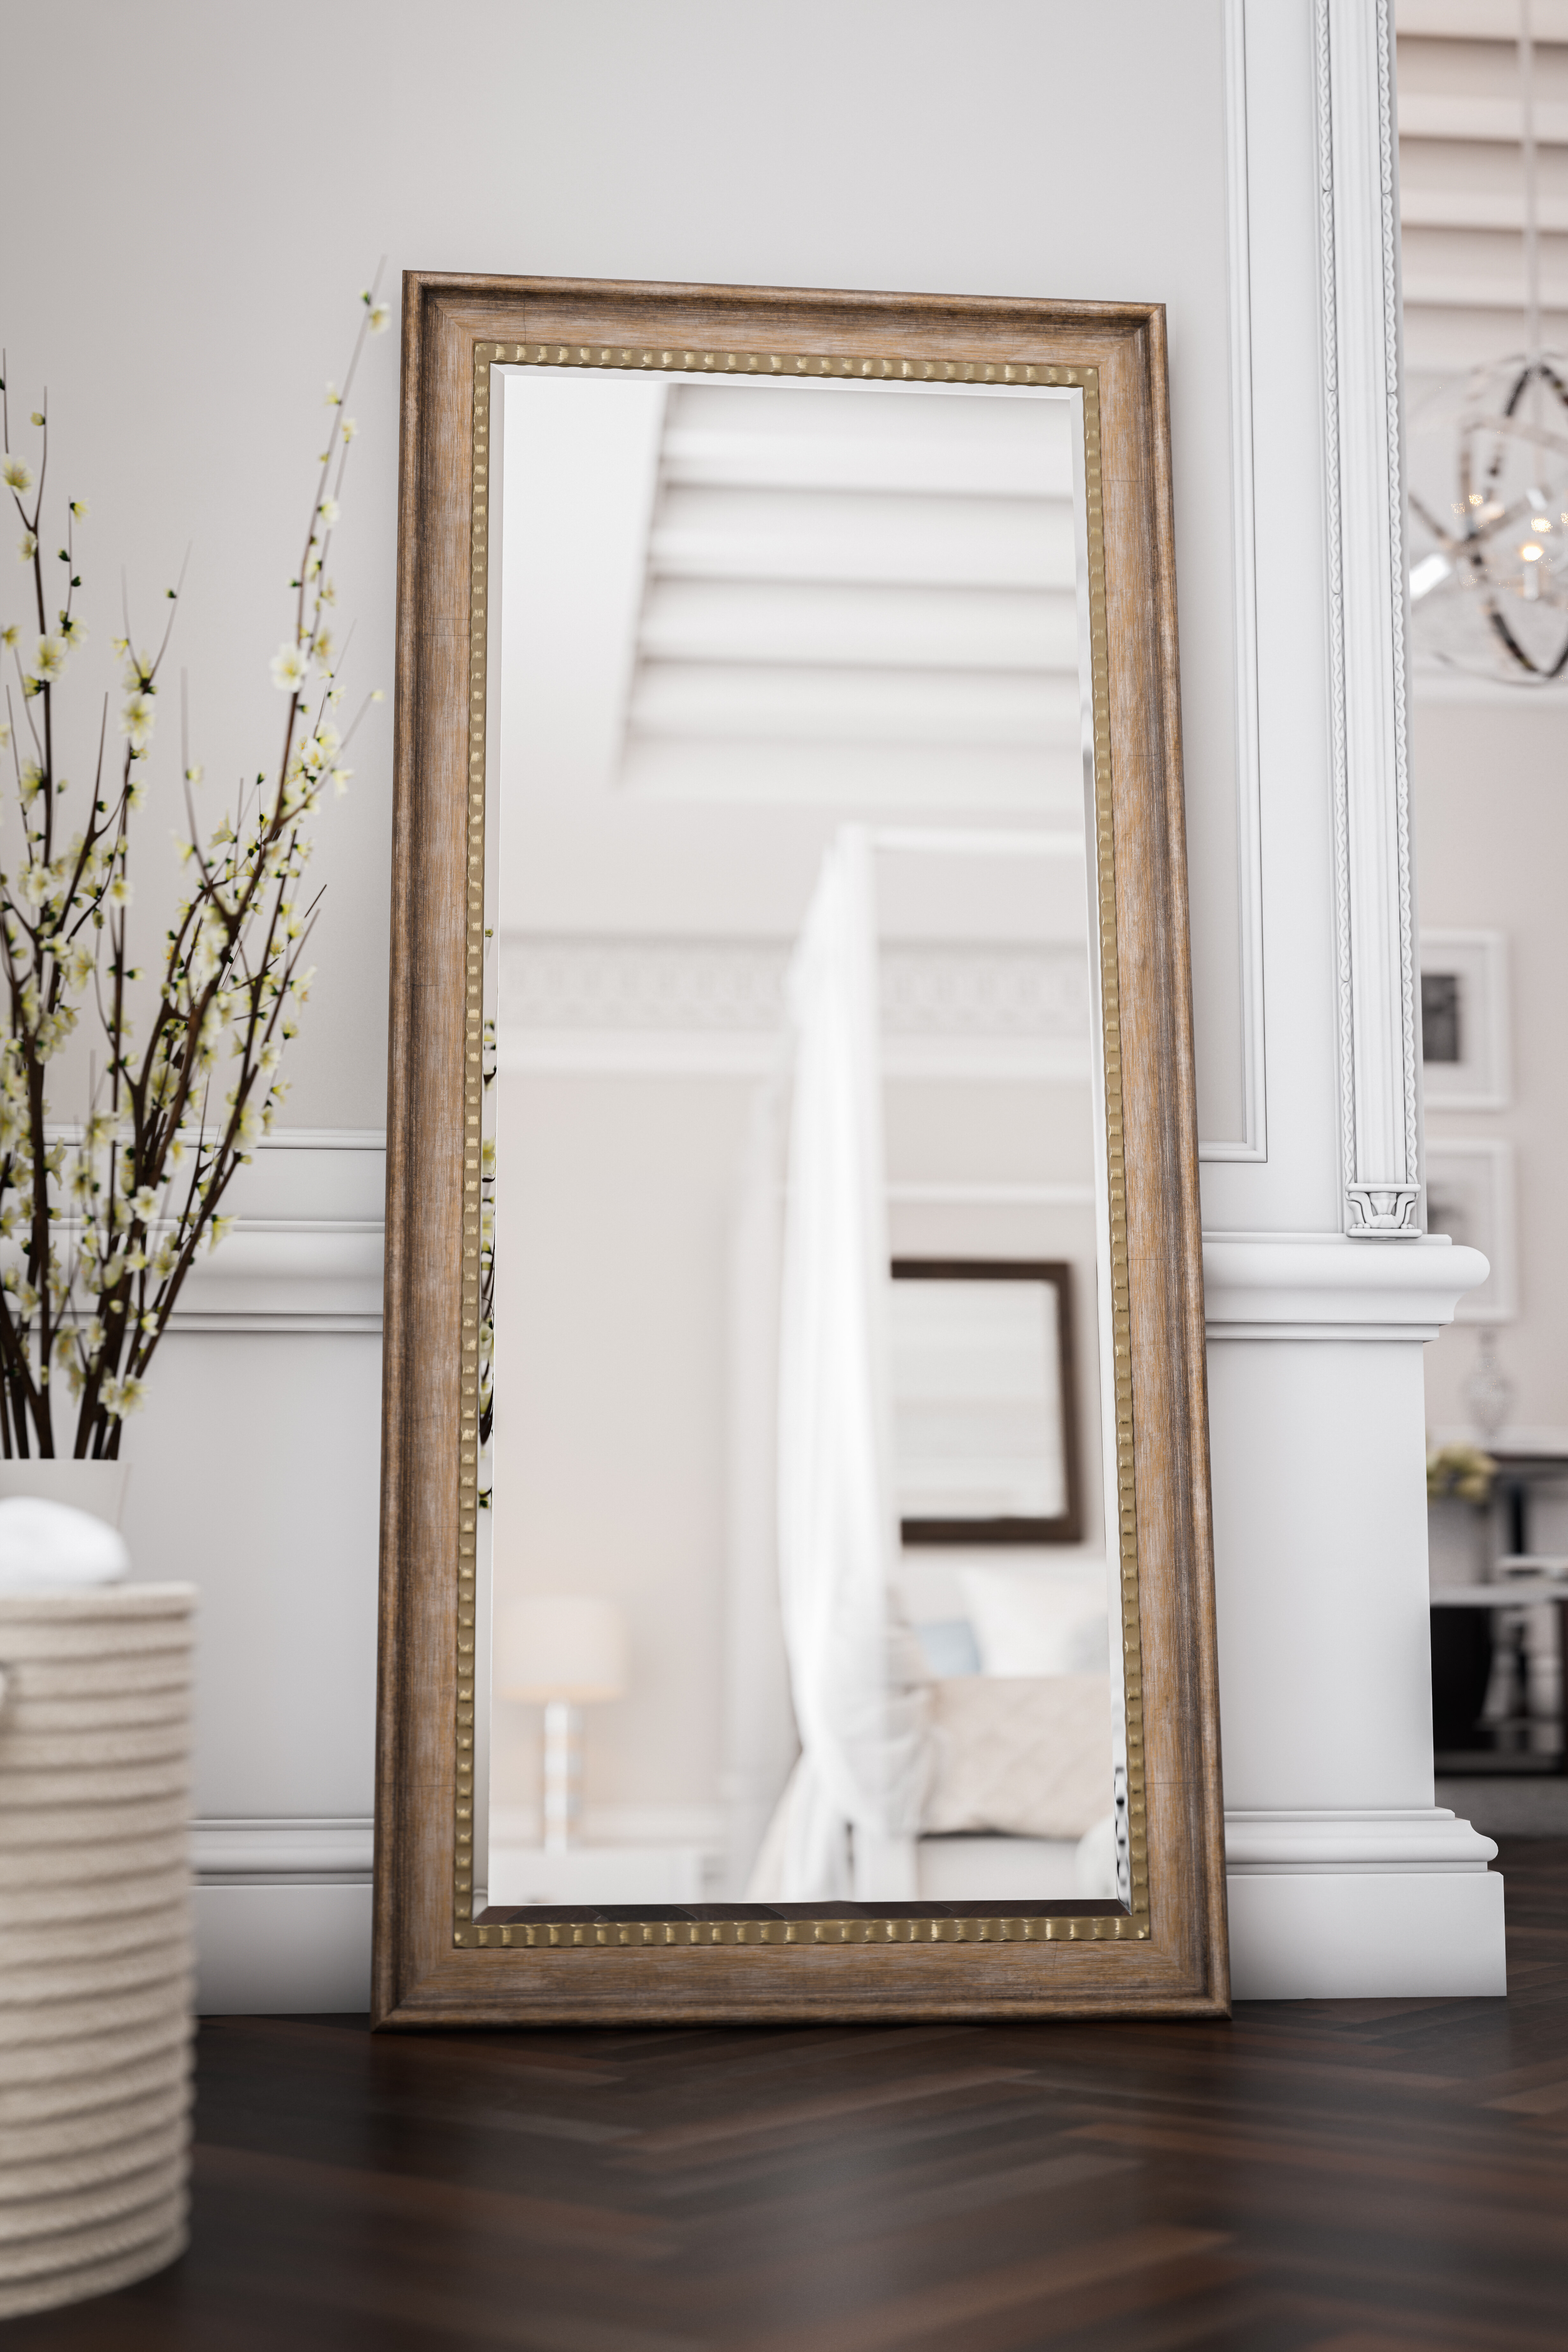 Foundry Select Brunswick Floor Rustic Beveled Distressed Full Length Mirror Reviews Wayfair